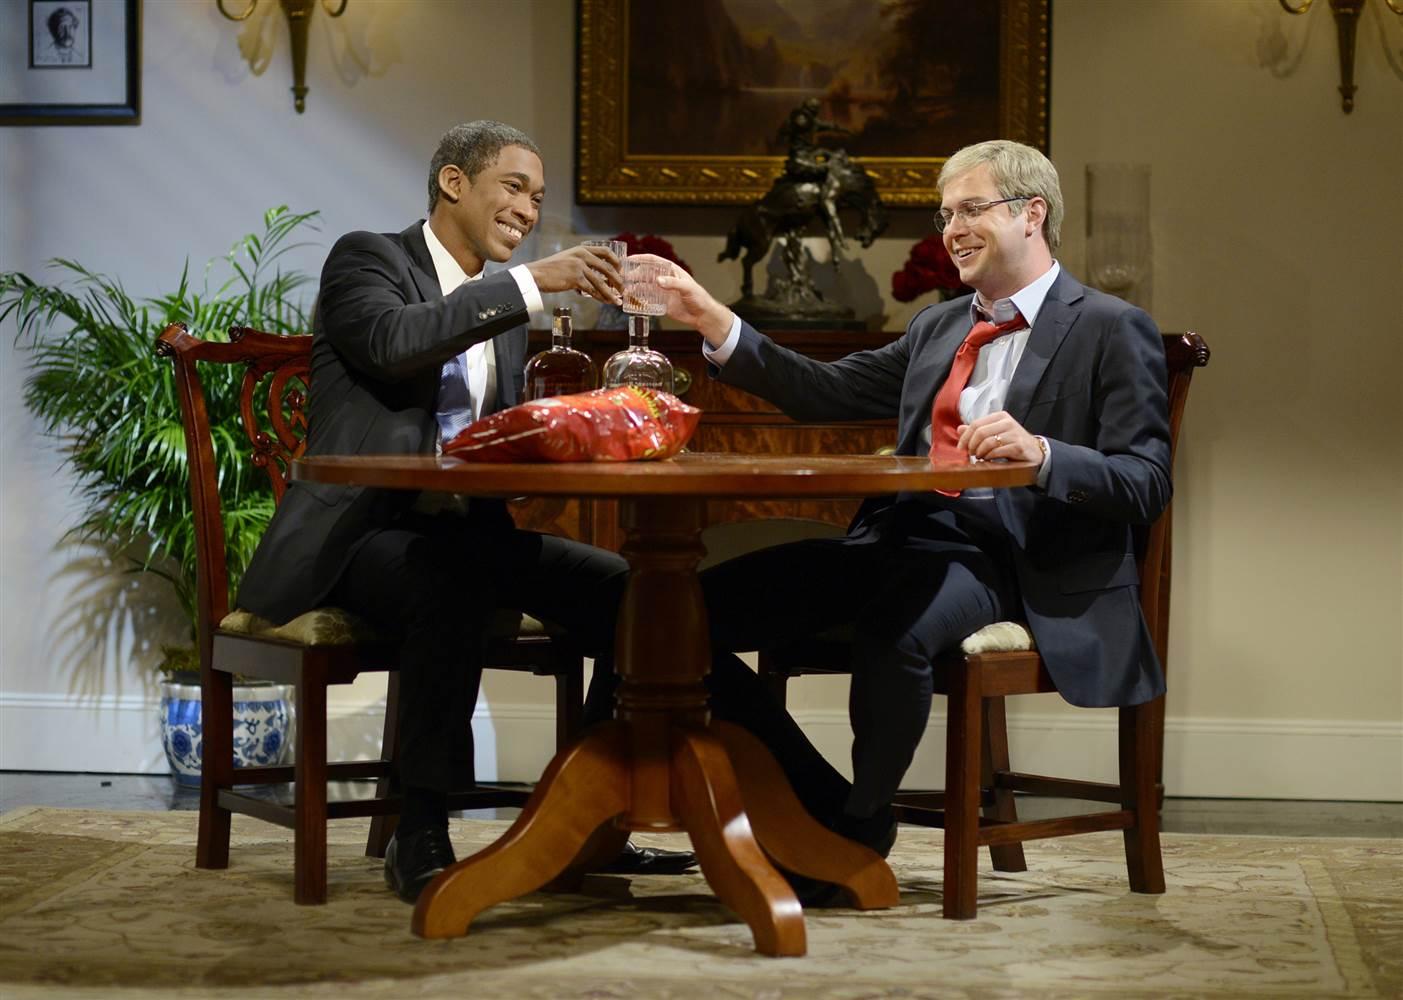 Photo of Jay Pharoah and Taran Killam Dumped By SNL